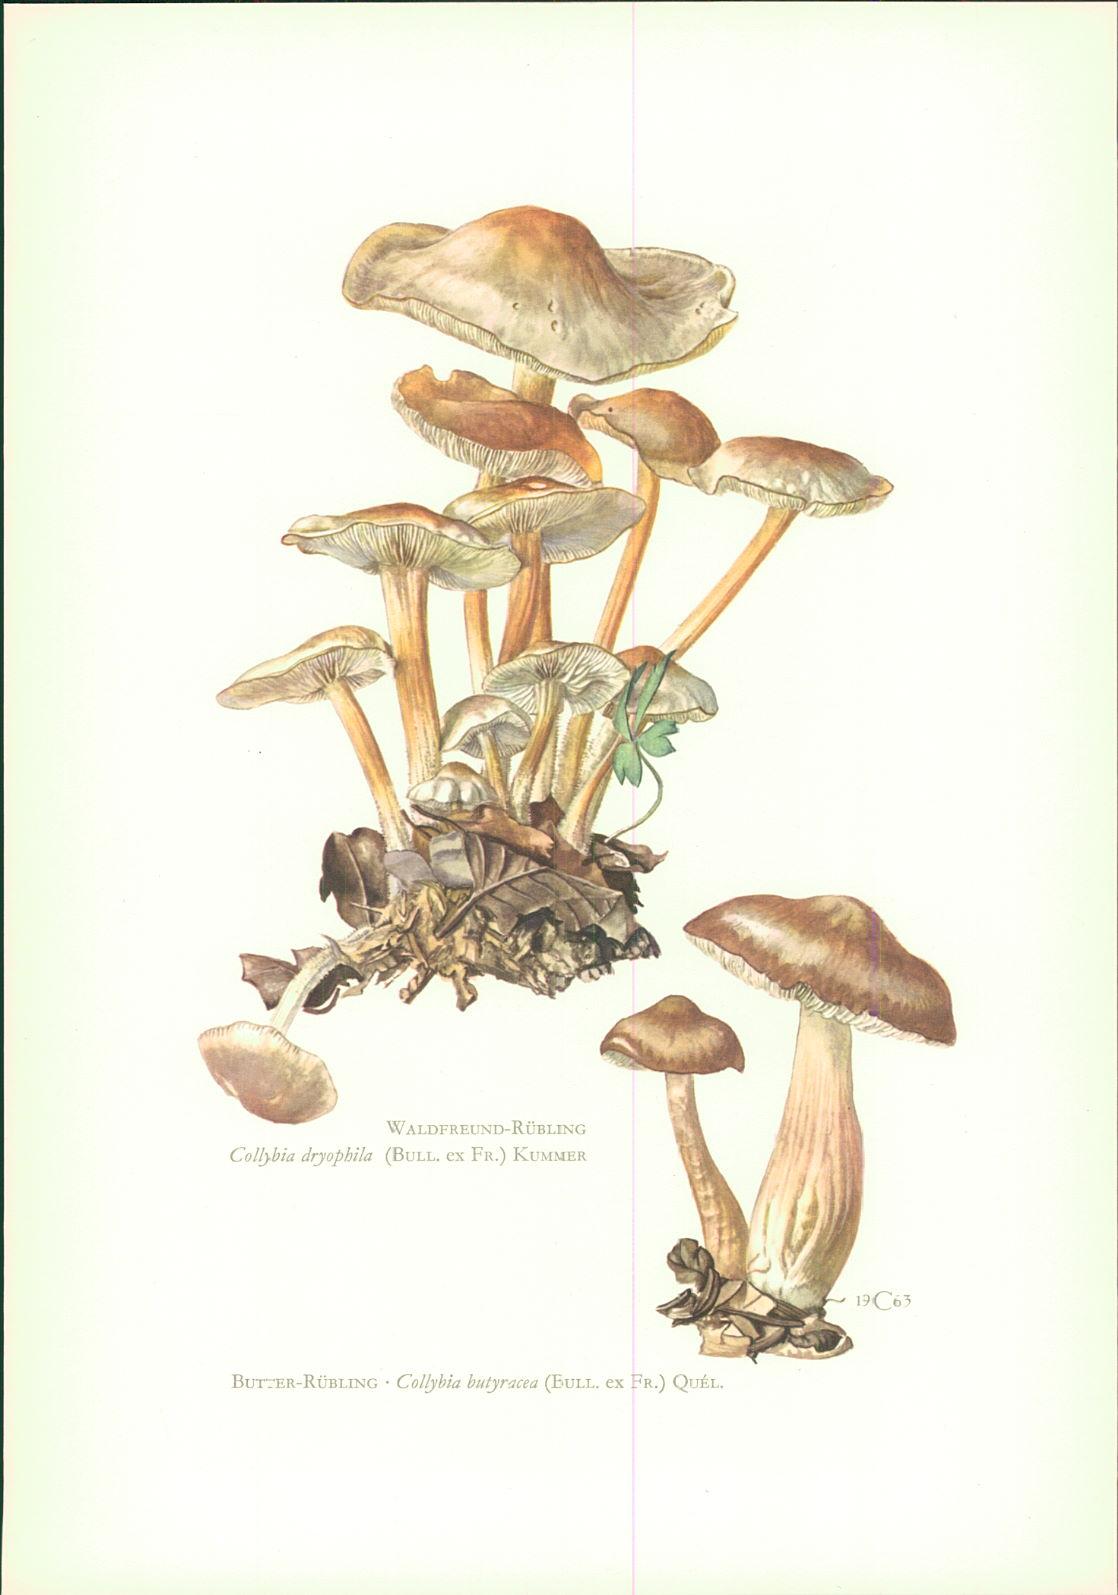 Caspari, C.: Pilze - Claus Caspari : Waldfreund-Rübling. Collybia dryophila (Bull. ex Fr.) Kummer Offset-Lithographie von C. Caspari. Butter-Rübling • Collybia butyracea (Bull. ex Fr.) Quel.